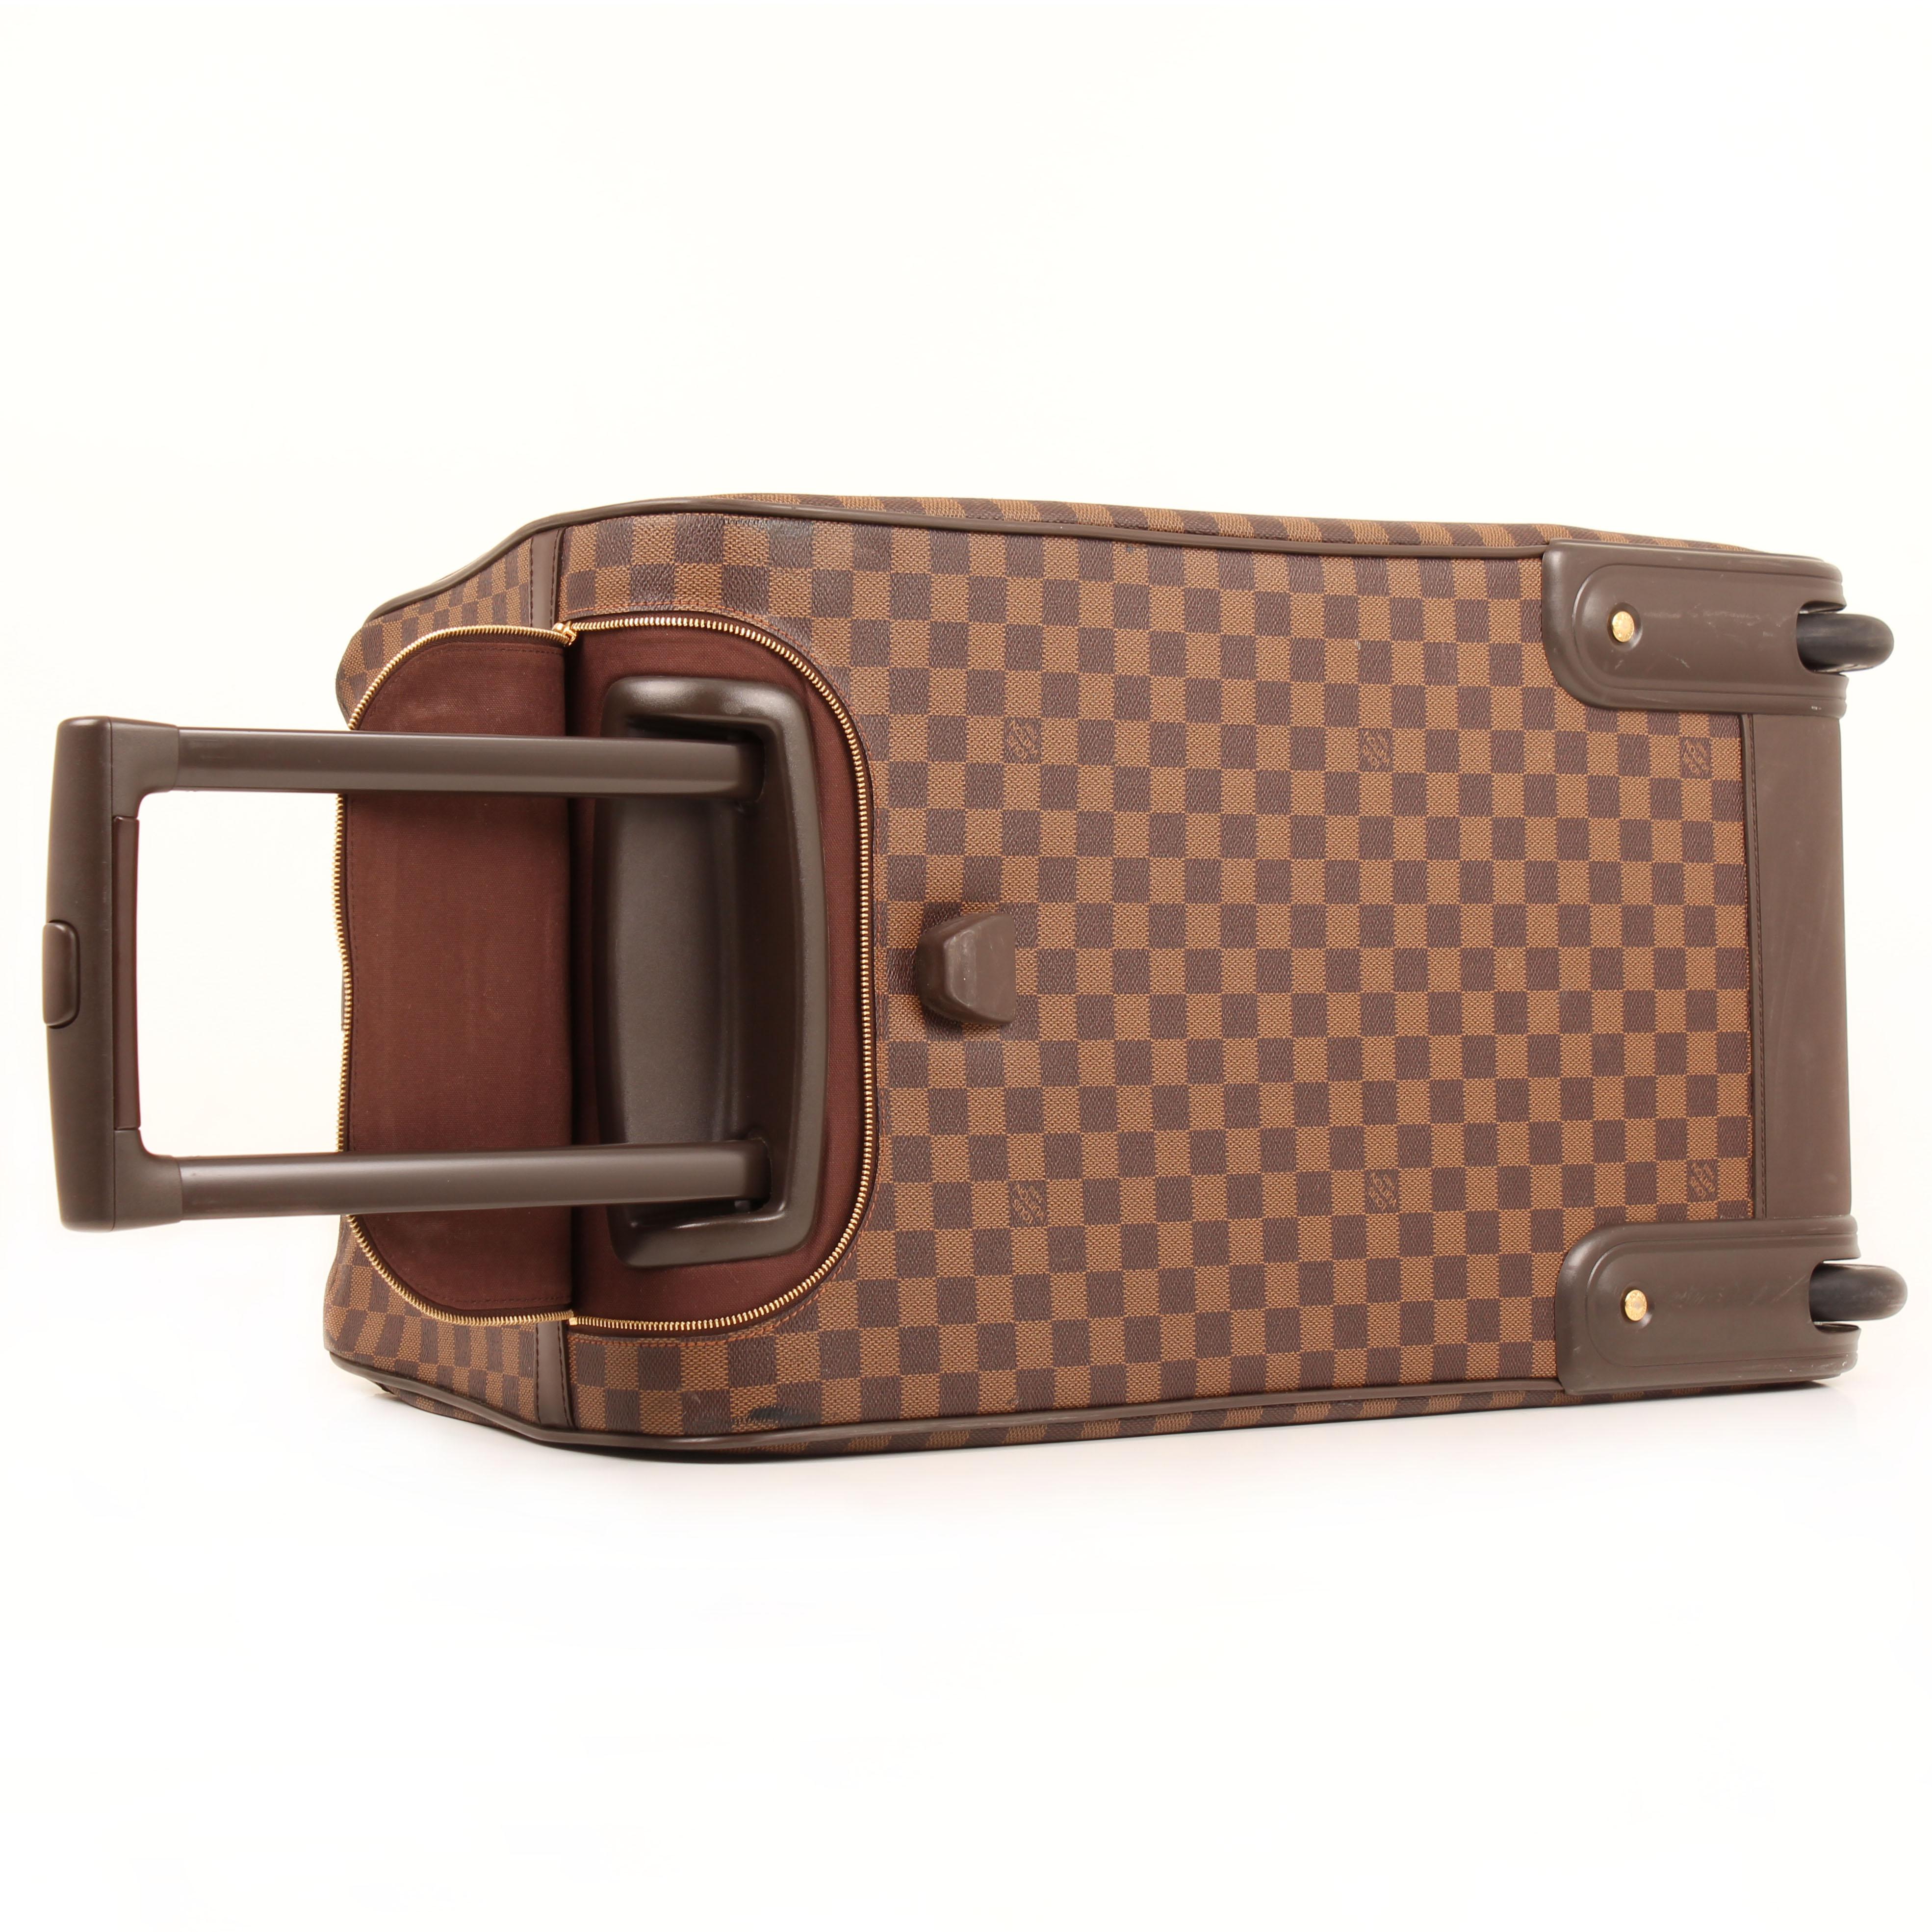 louis vuitton bolsa de viaje eole rolling luggage damier ebene asa telescopica